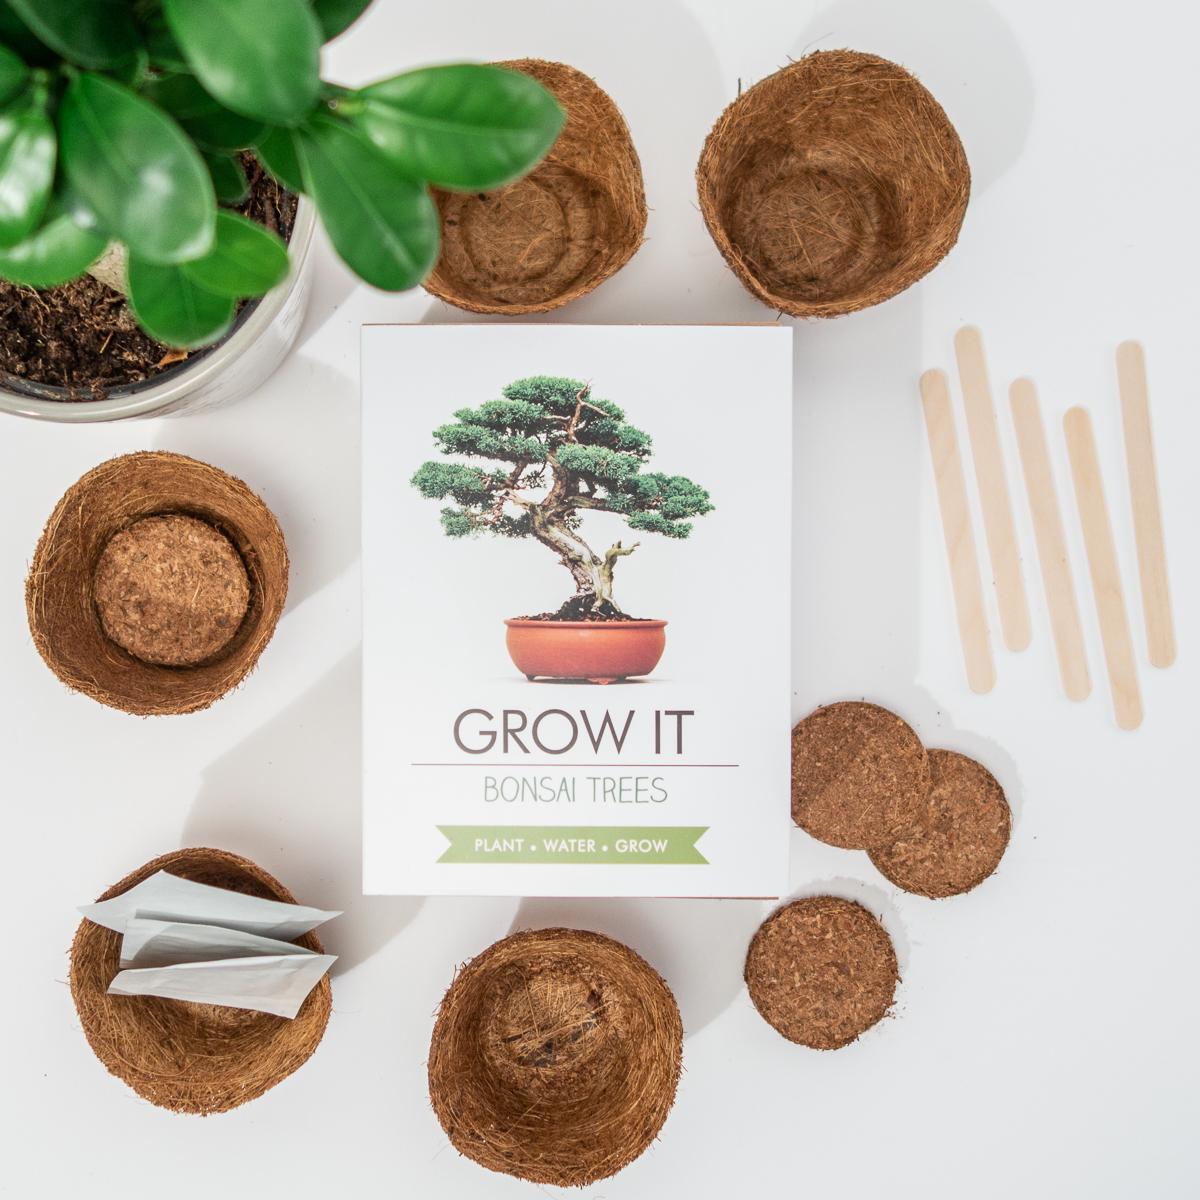 Grow It Bonsai-Bäume